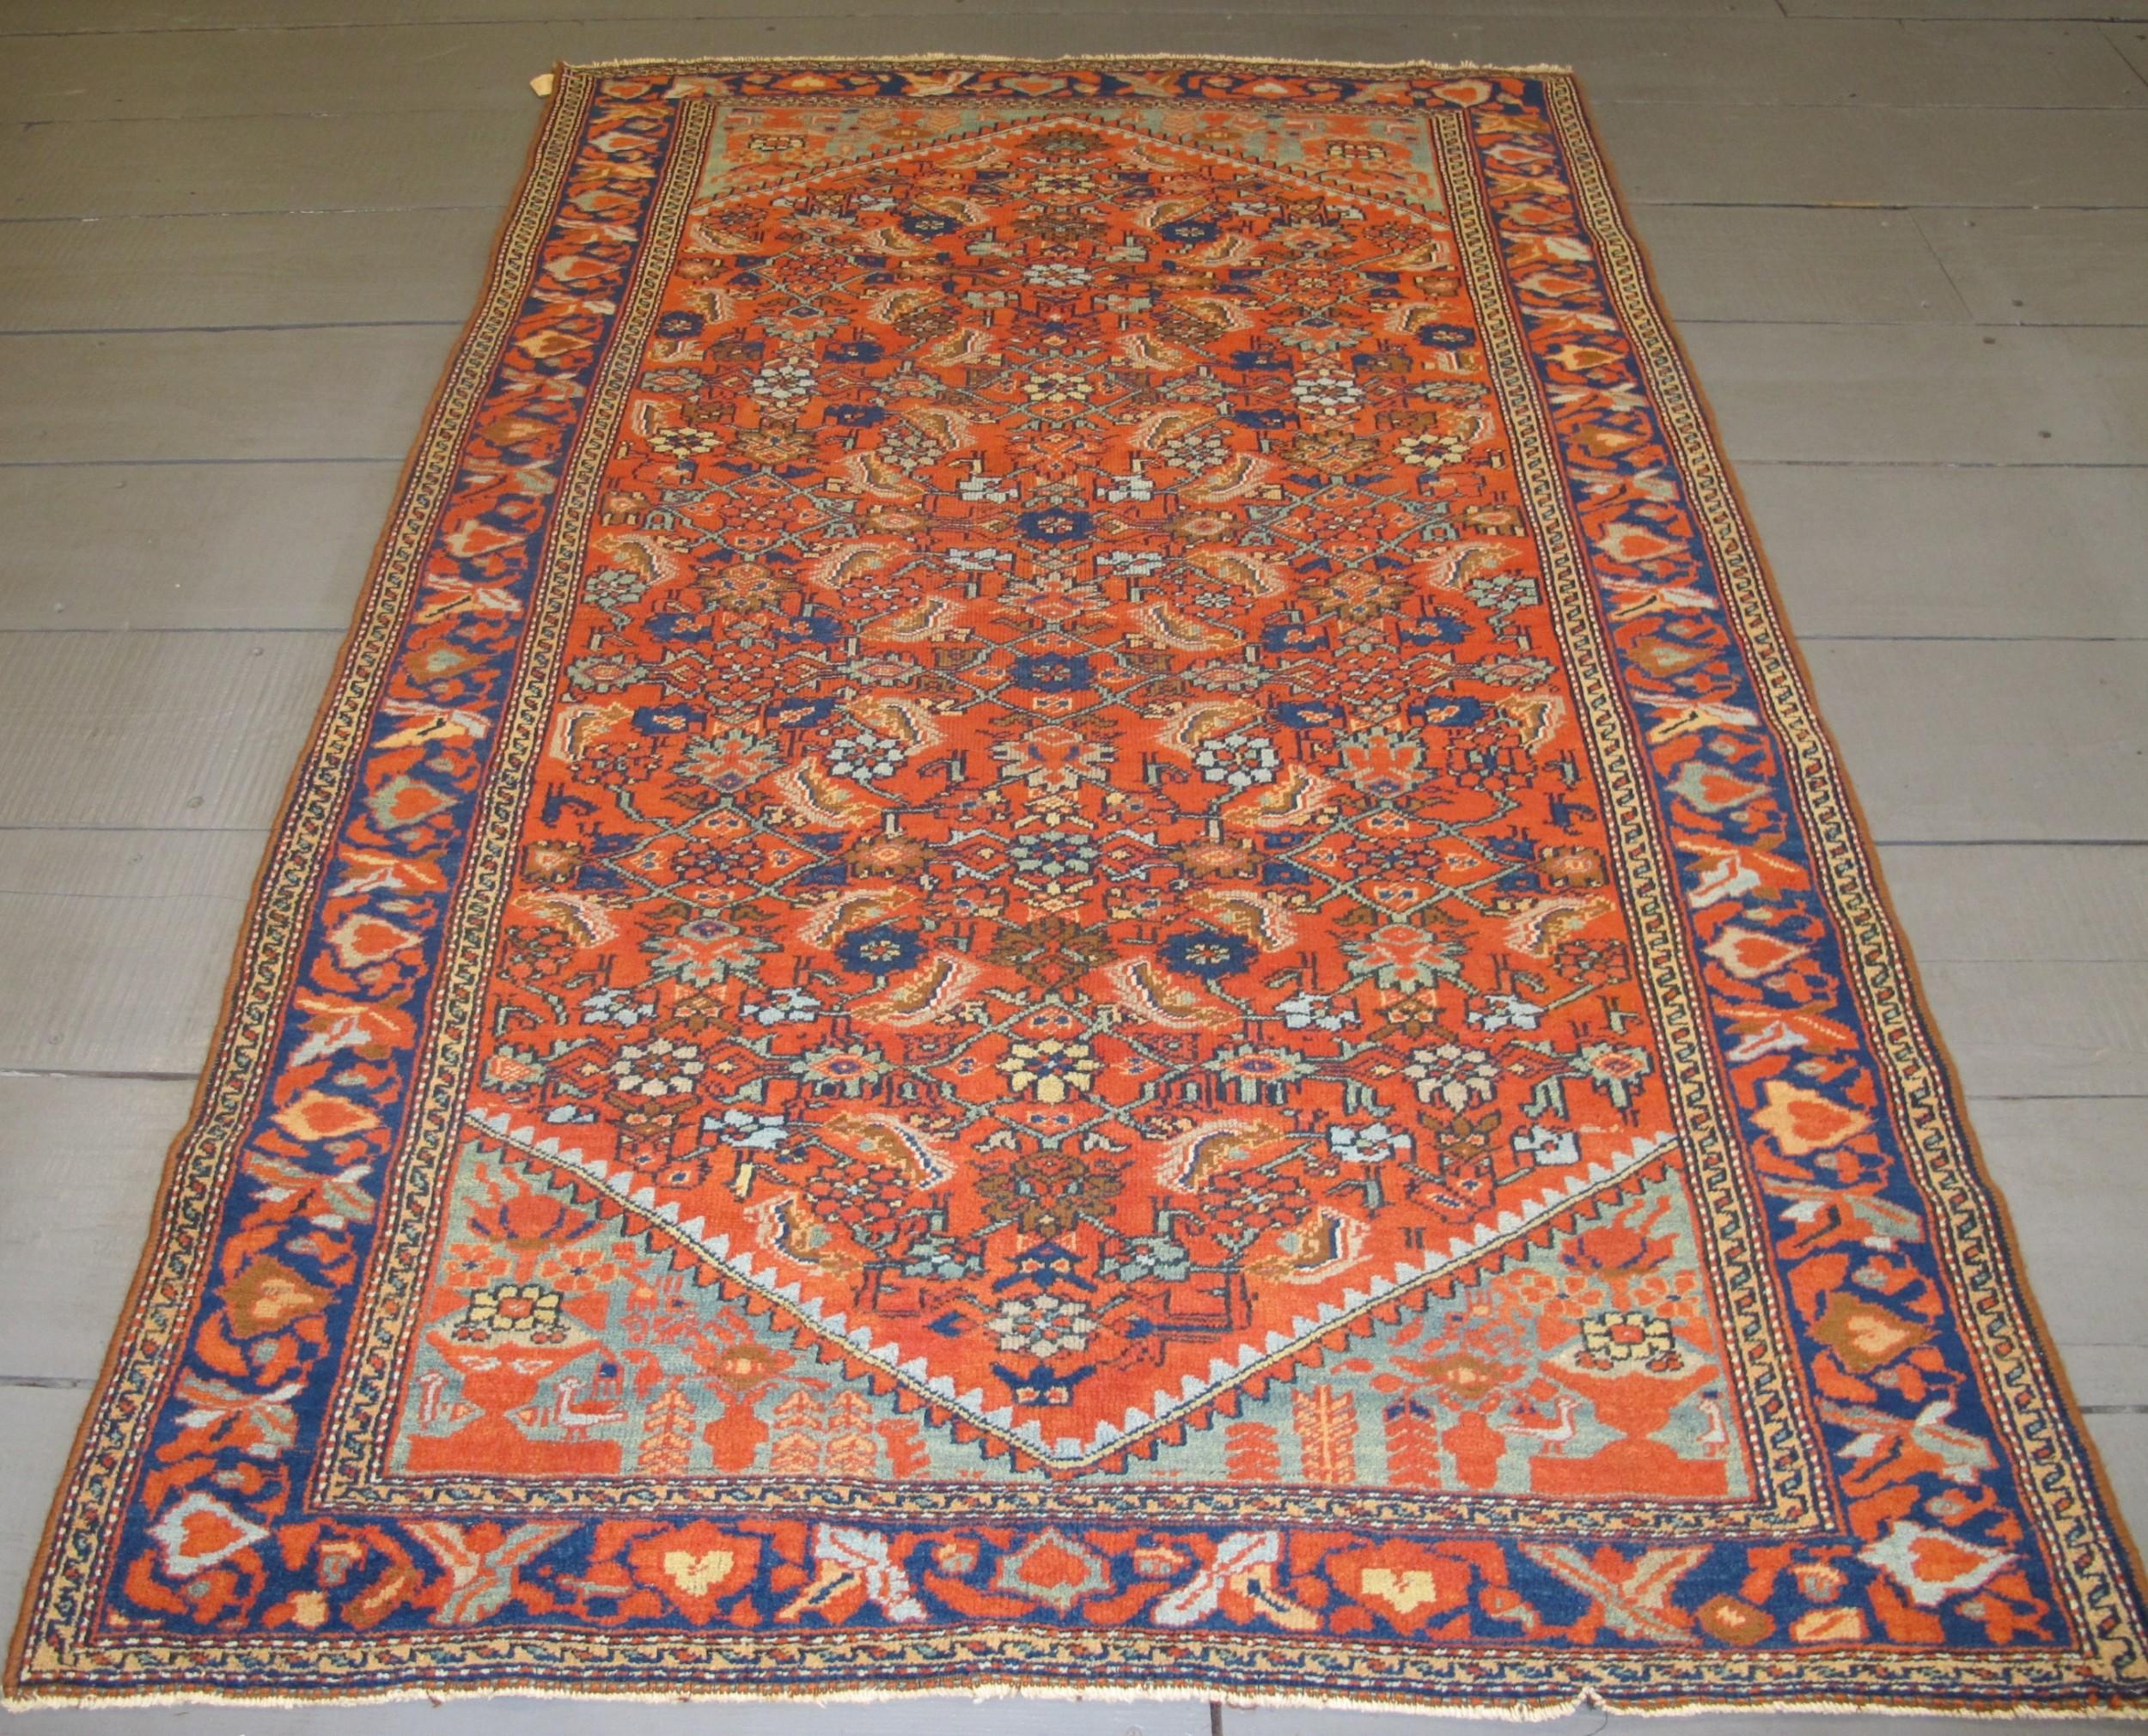 fine antique west persian rug 205m x 132m 6'9 x 4'3